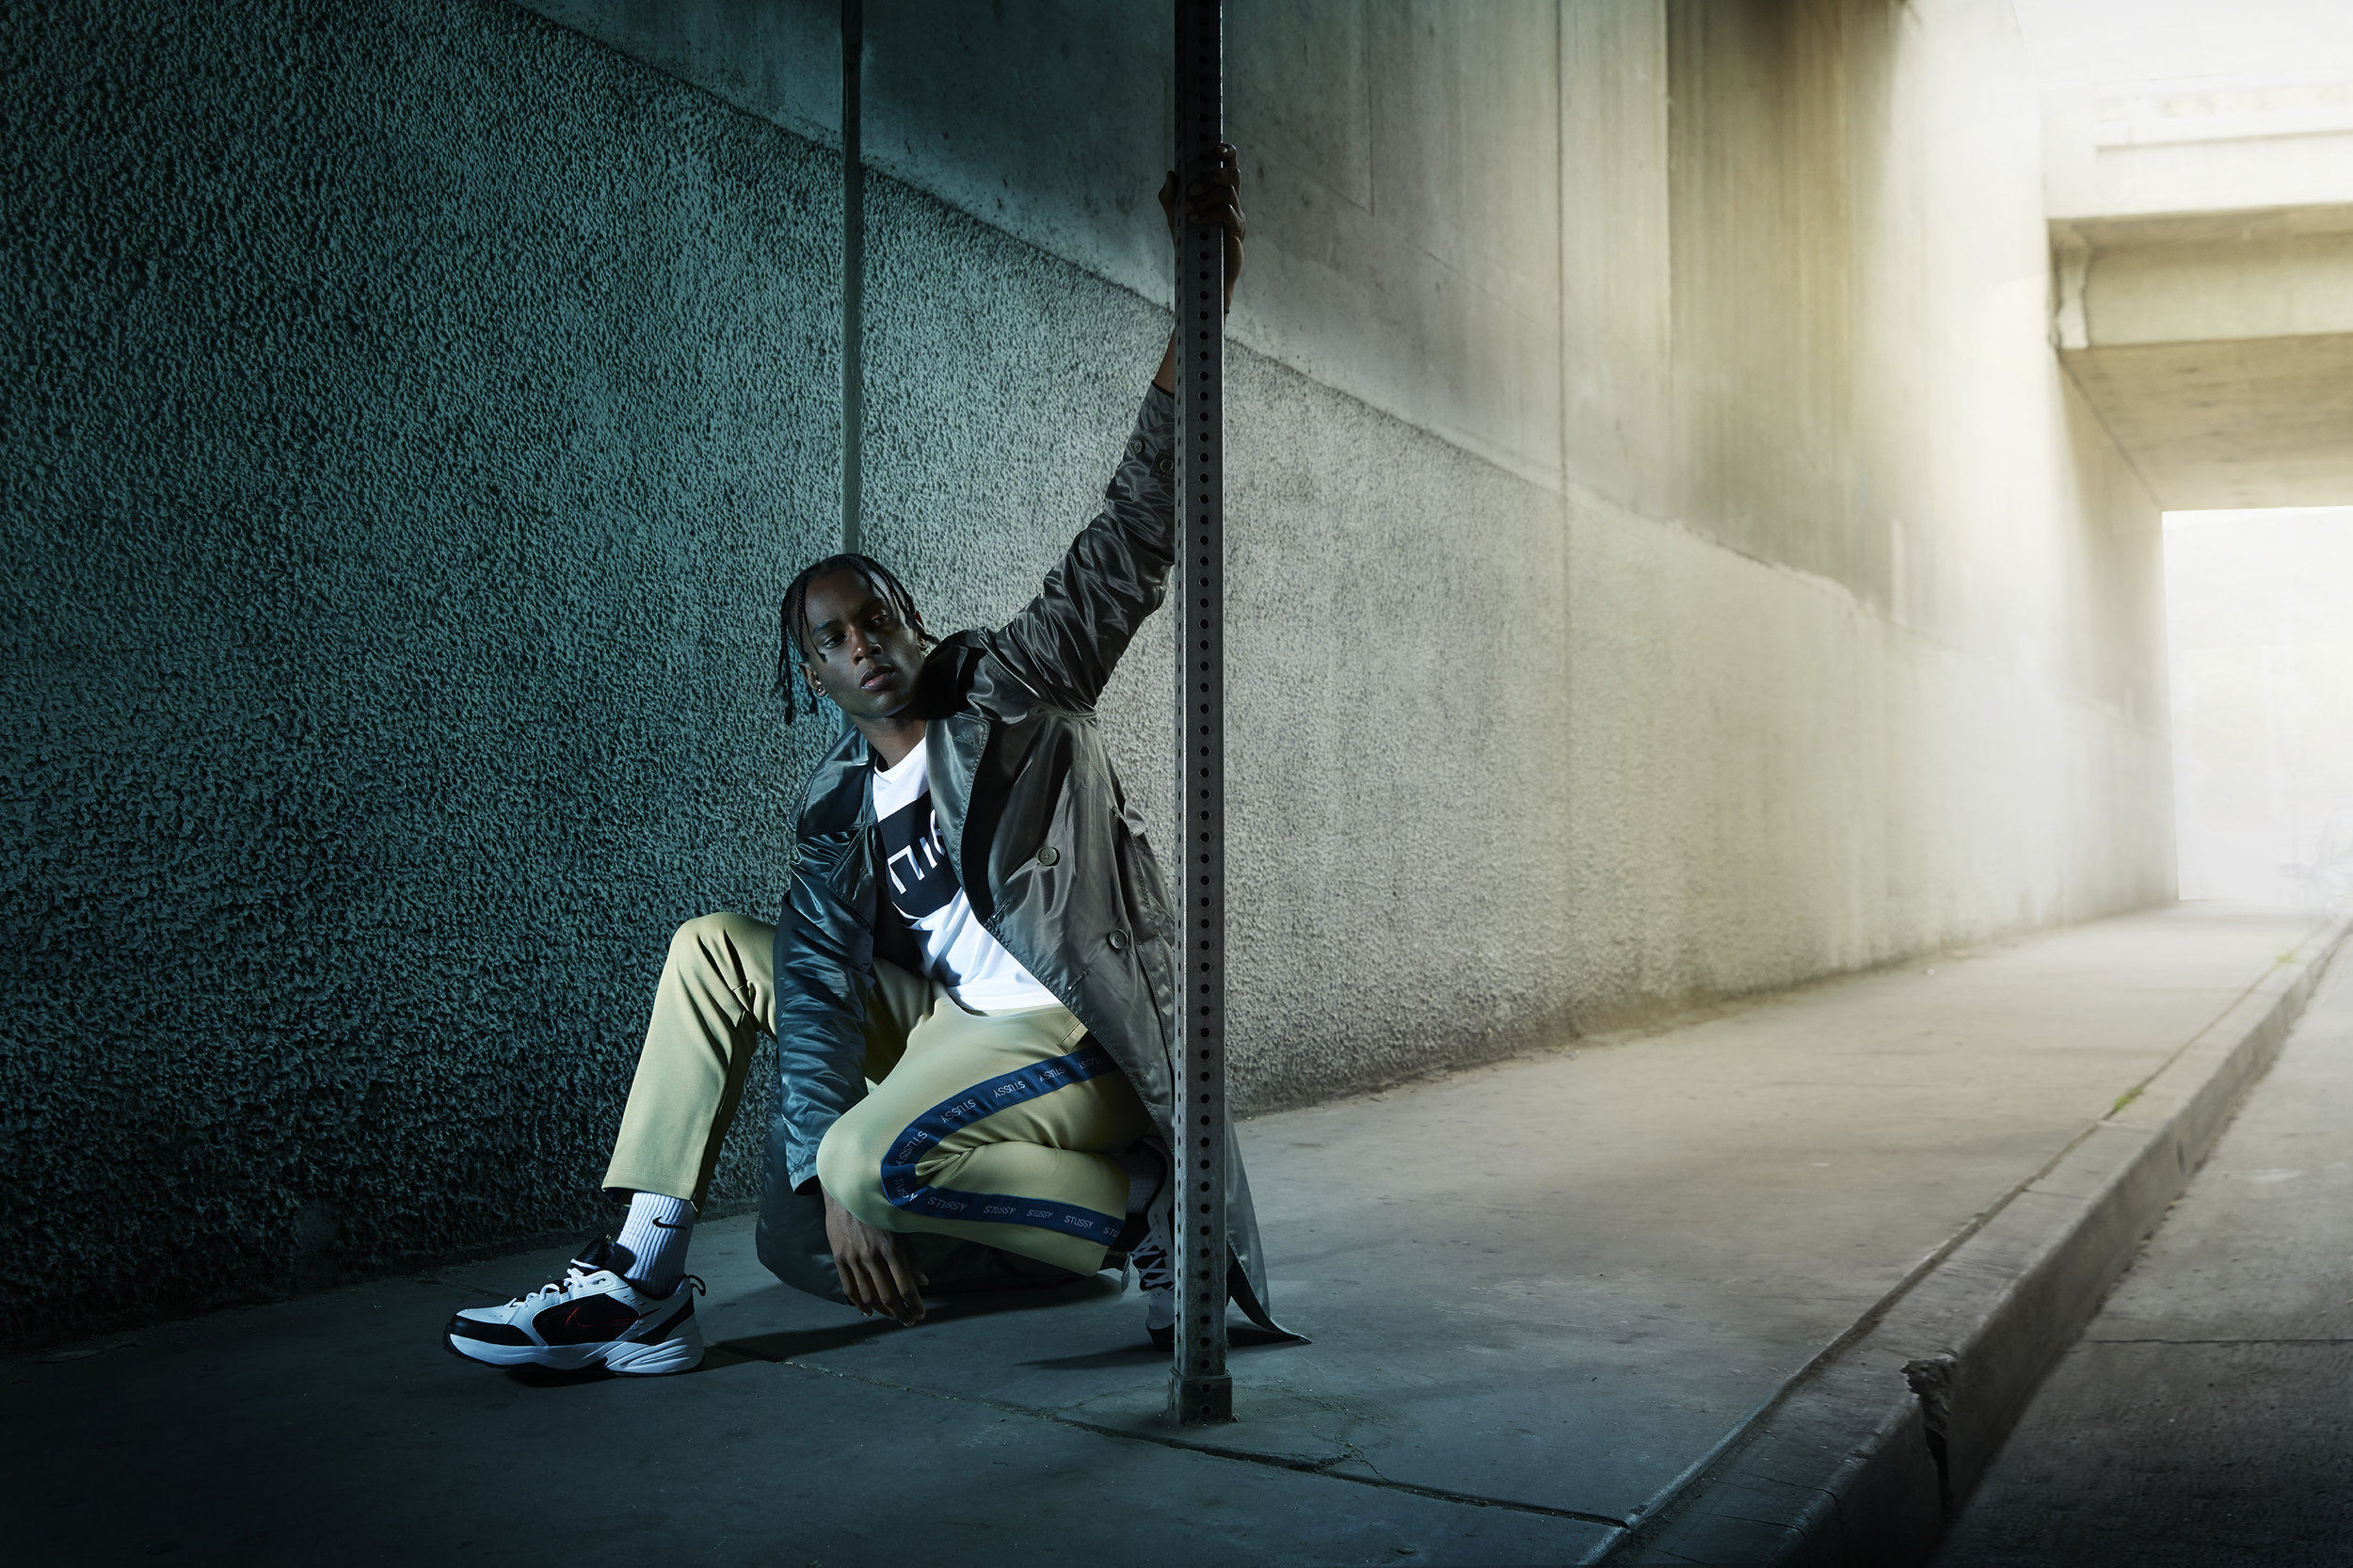 Nike-Location_0356.jpg